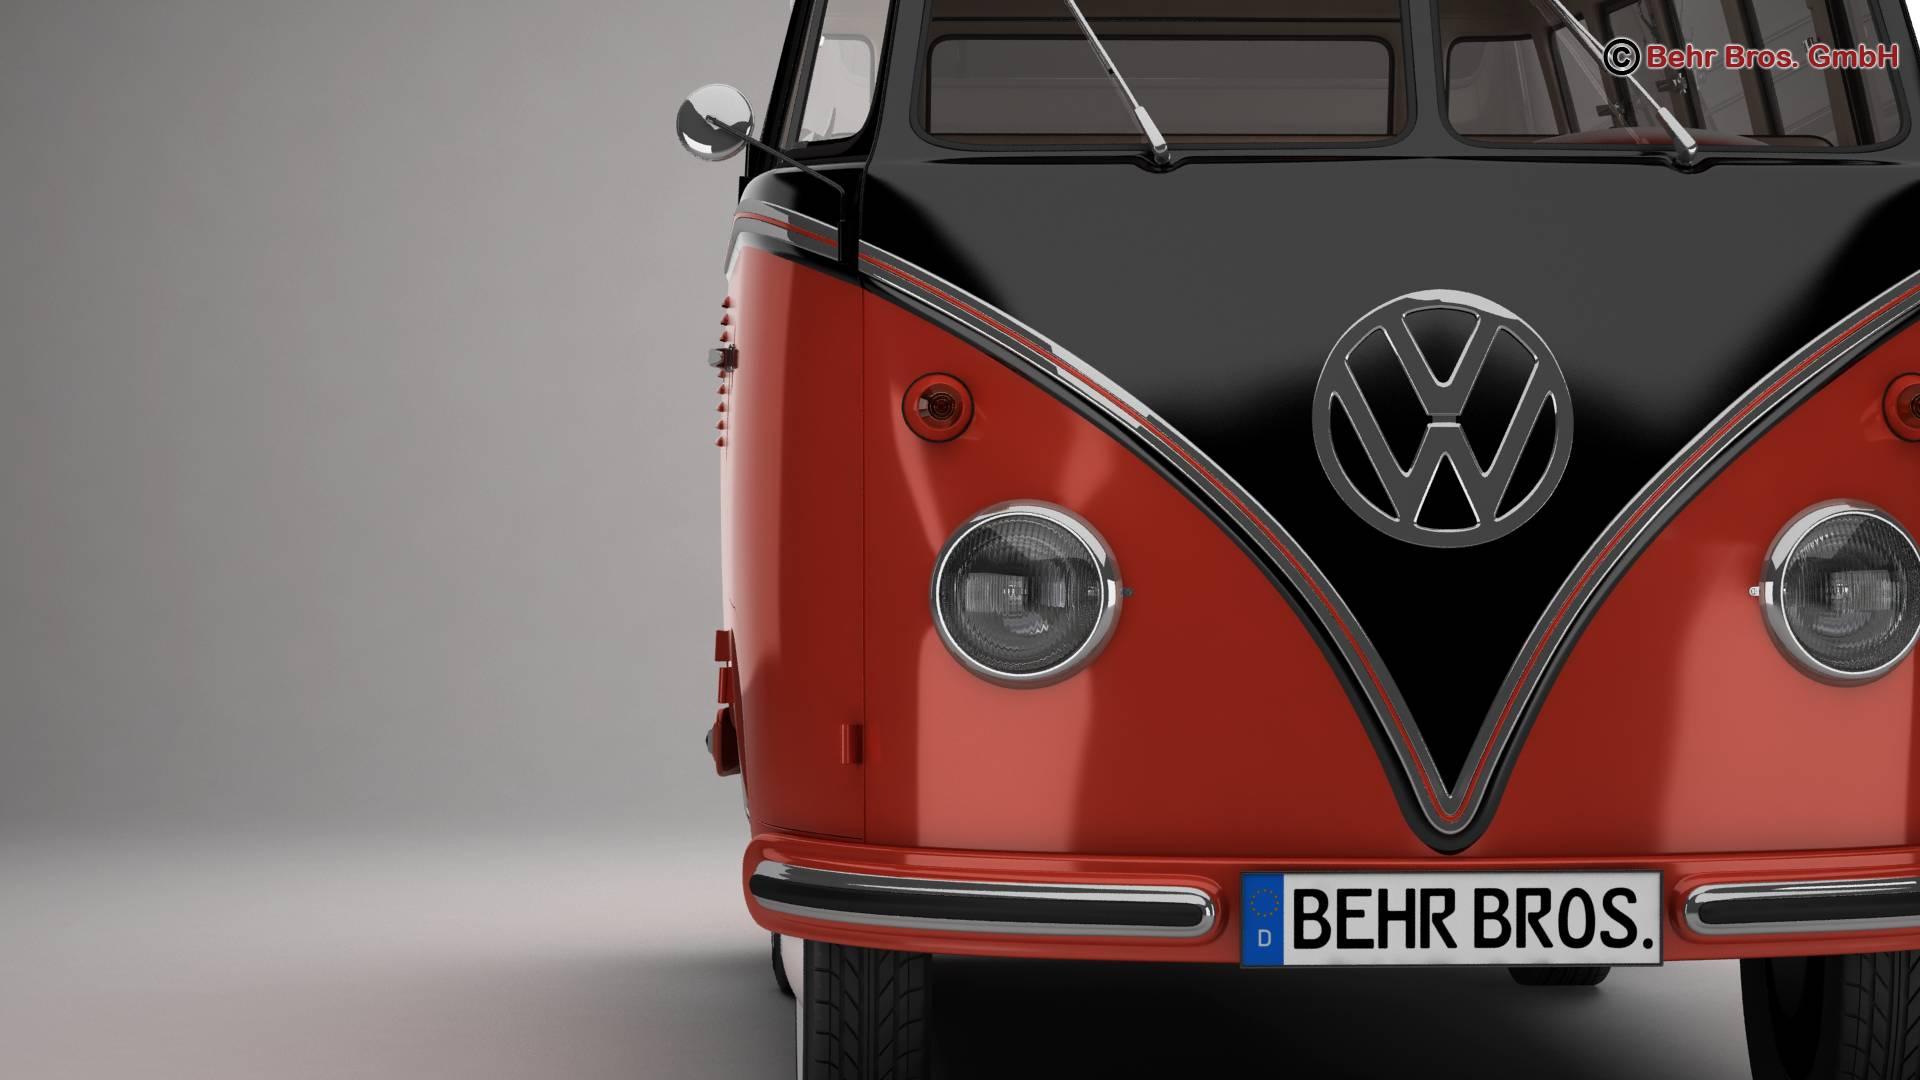 volkswagen type 2 samba 1959 3d model 3ds max fbx c4d lwo ma mb obj 217112